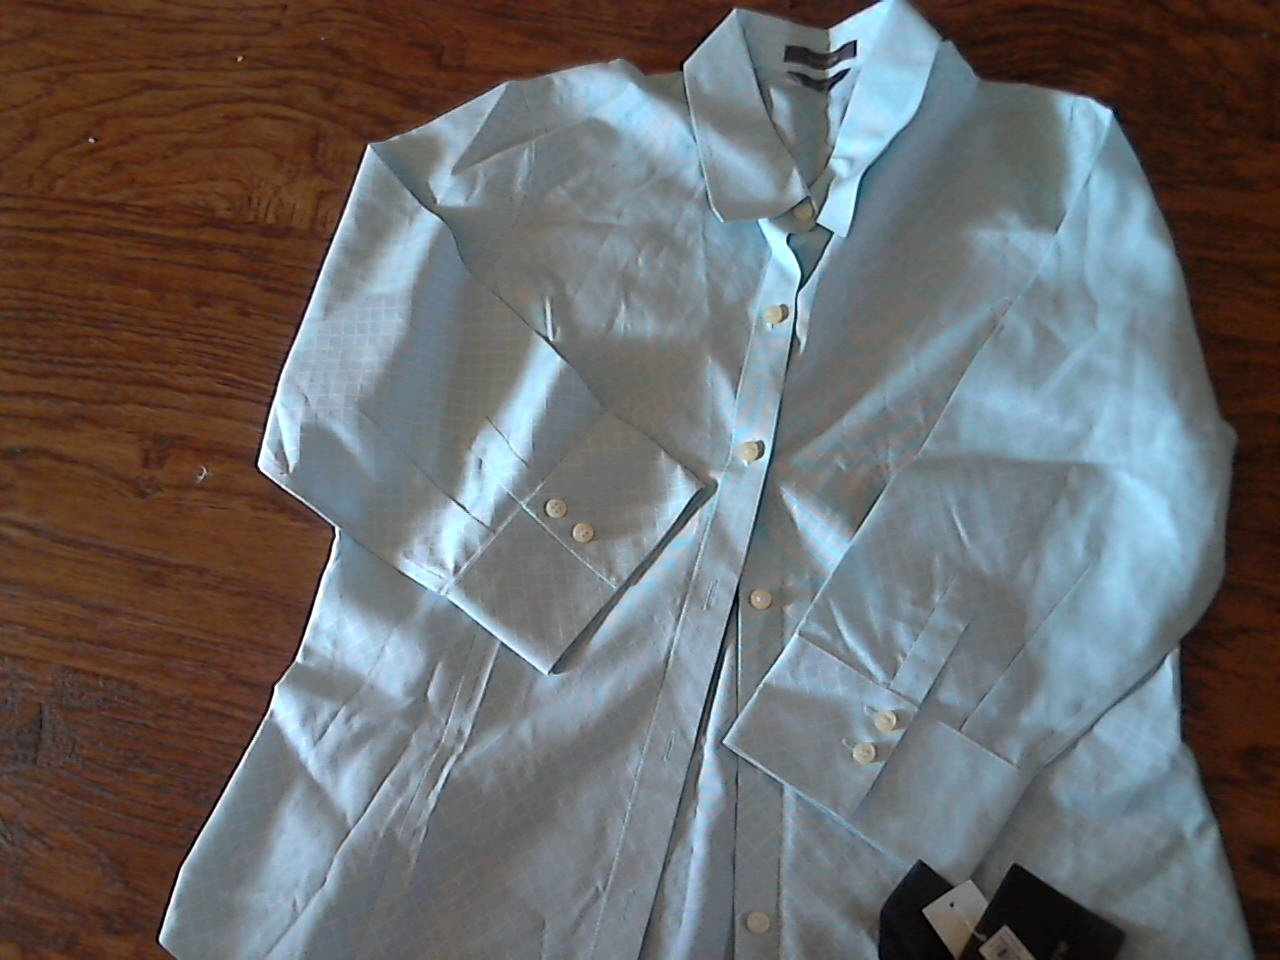 New Liz Claiborne man's light blue long sleeve shirt size 12